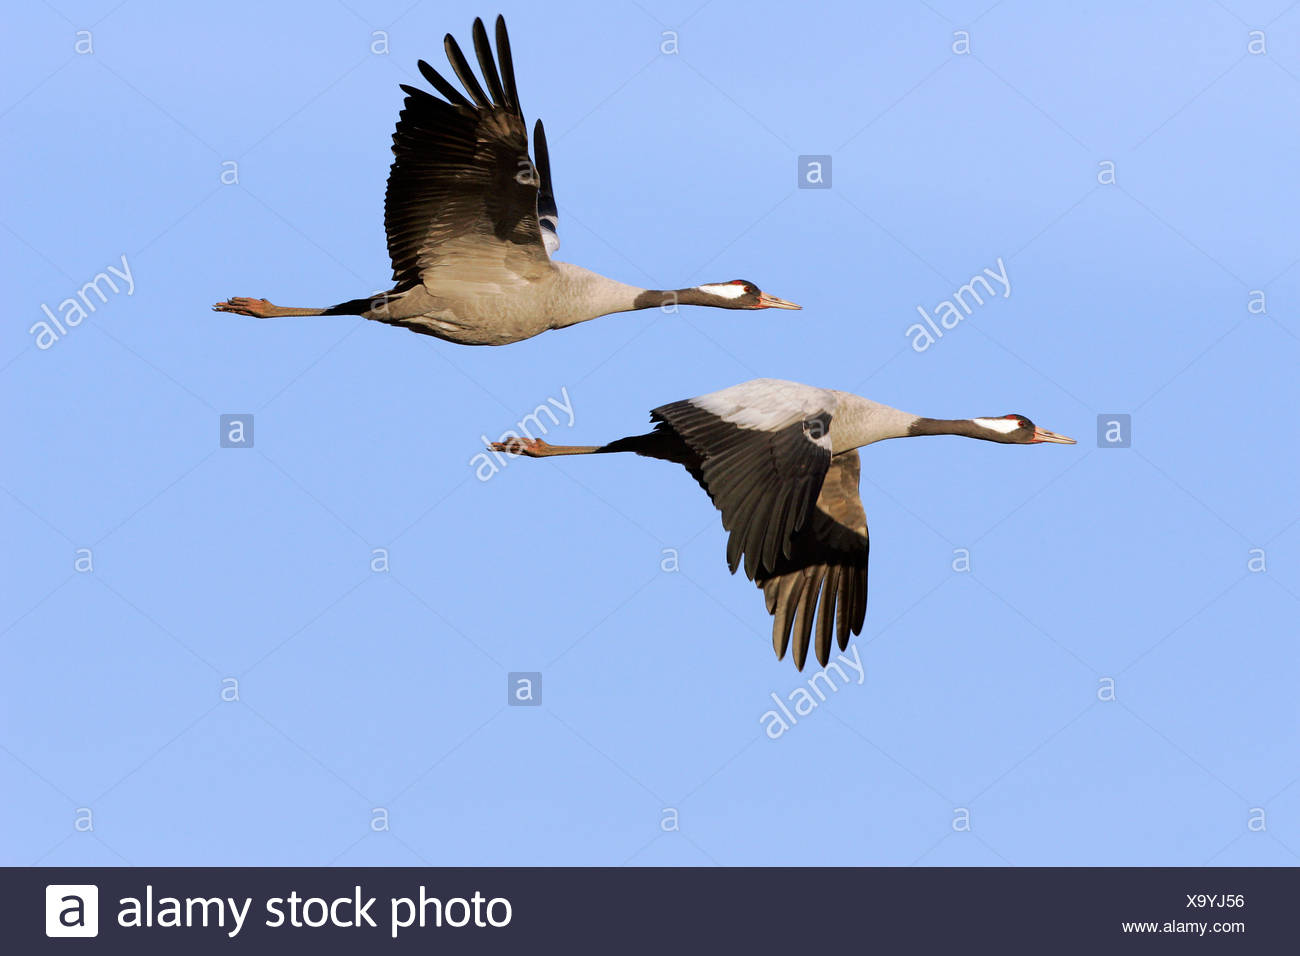 Couple of flying common cranes (Grus grus) - Lake Hornborga, Sweden, Europe, Stock Photo